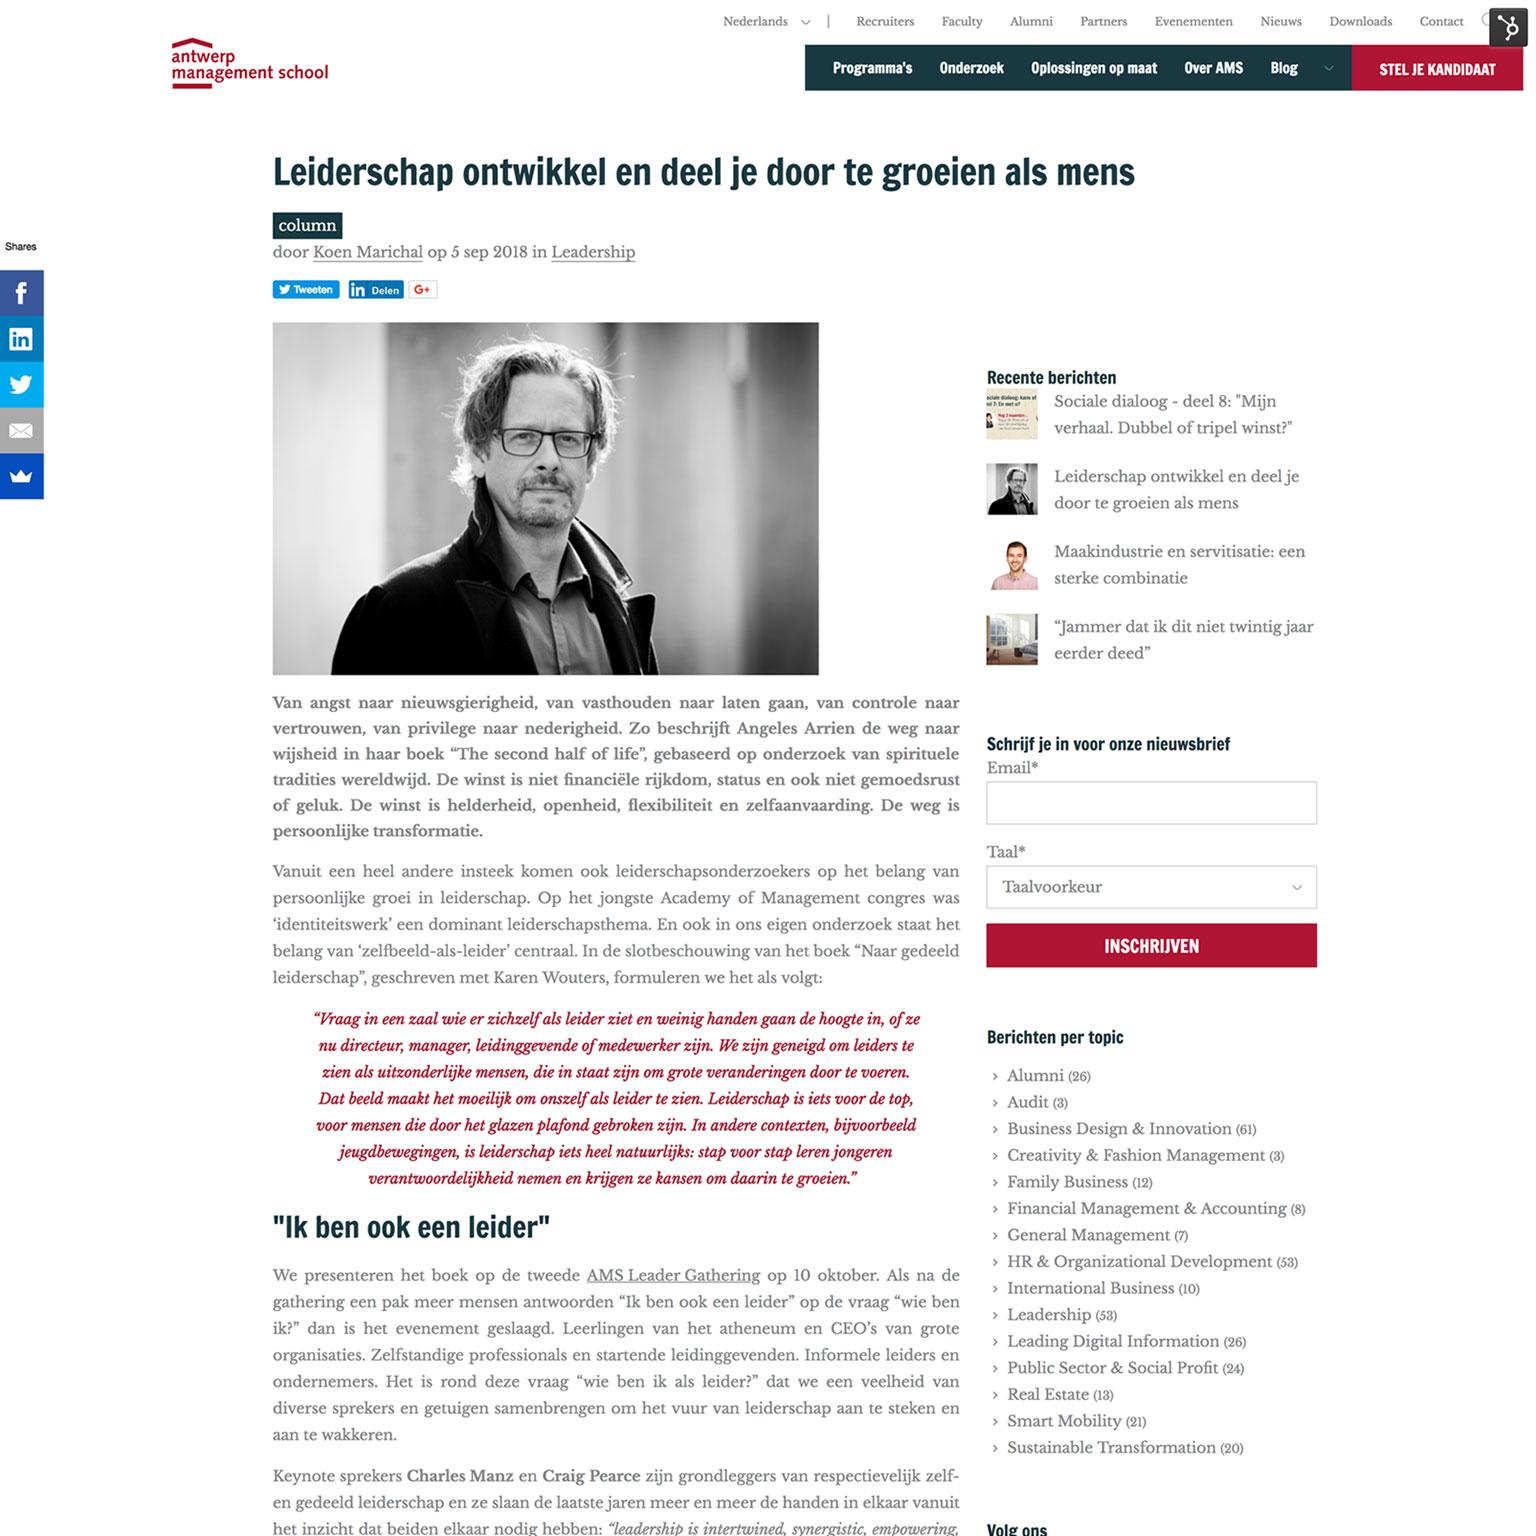 1536x1536-case-study-antwerpmanagementschool-blog-detail